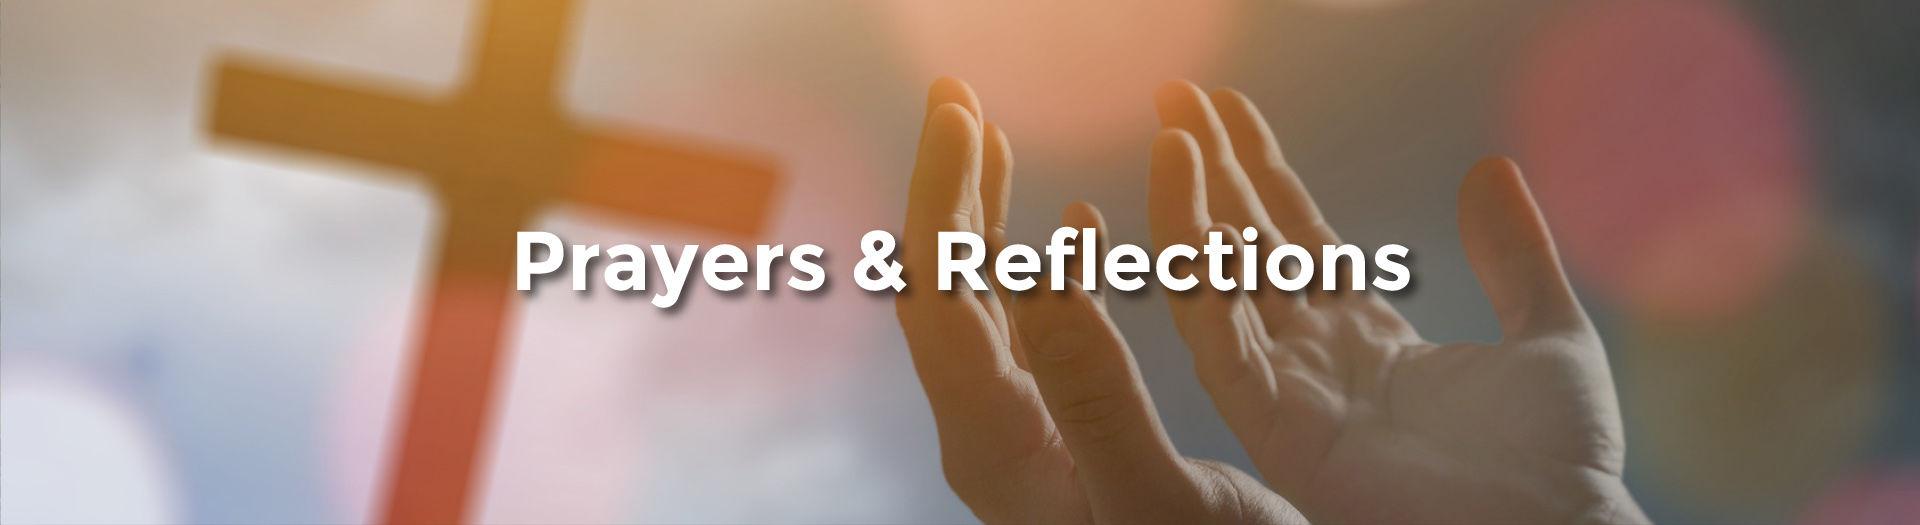 Prayers & Reflections